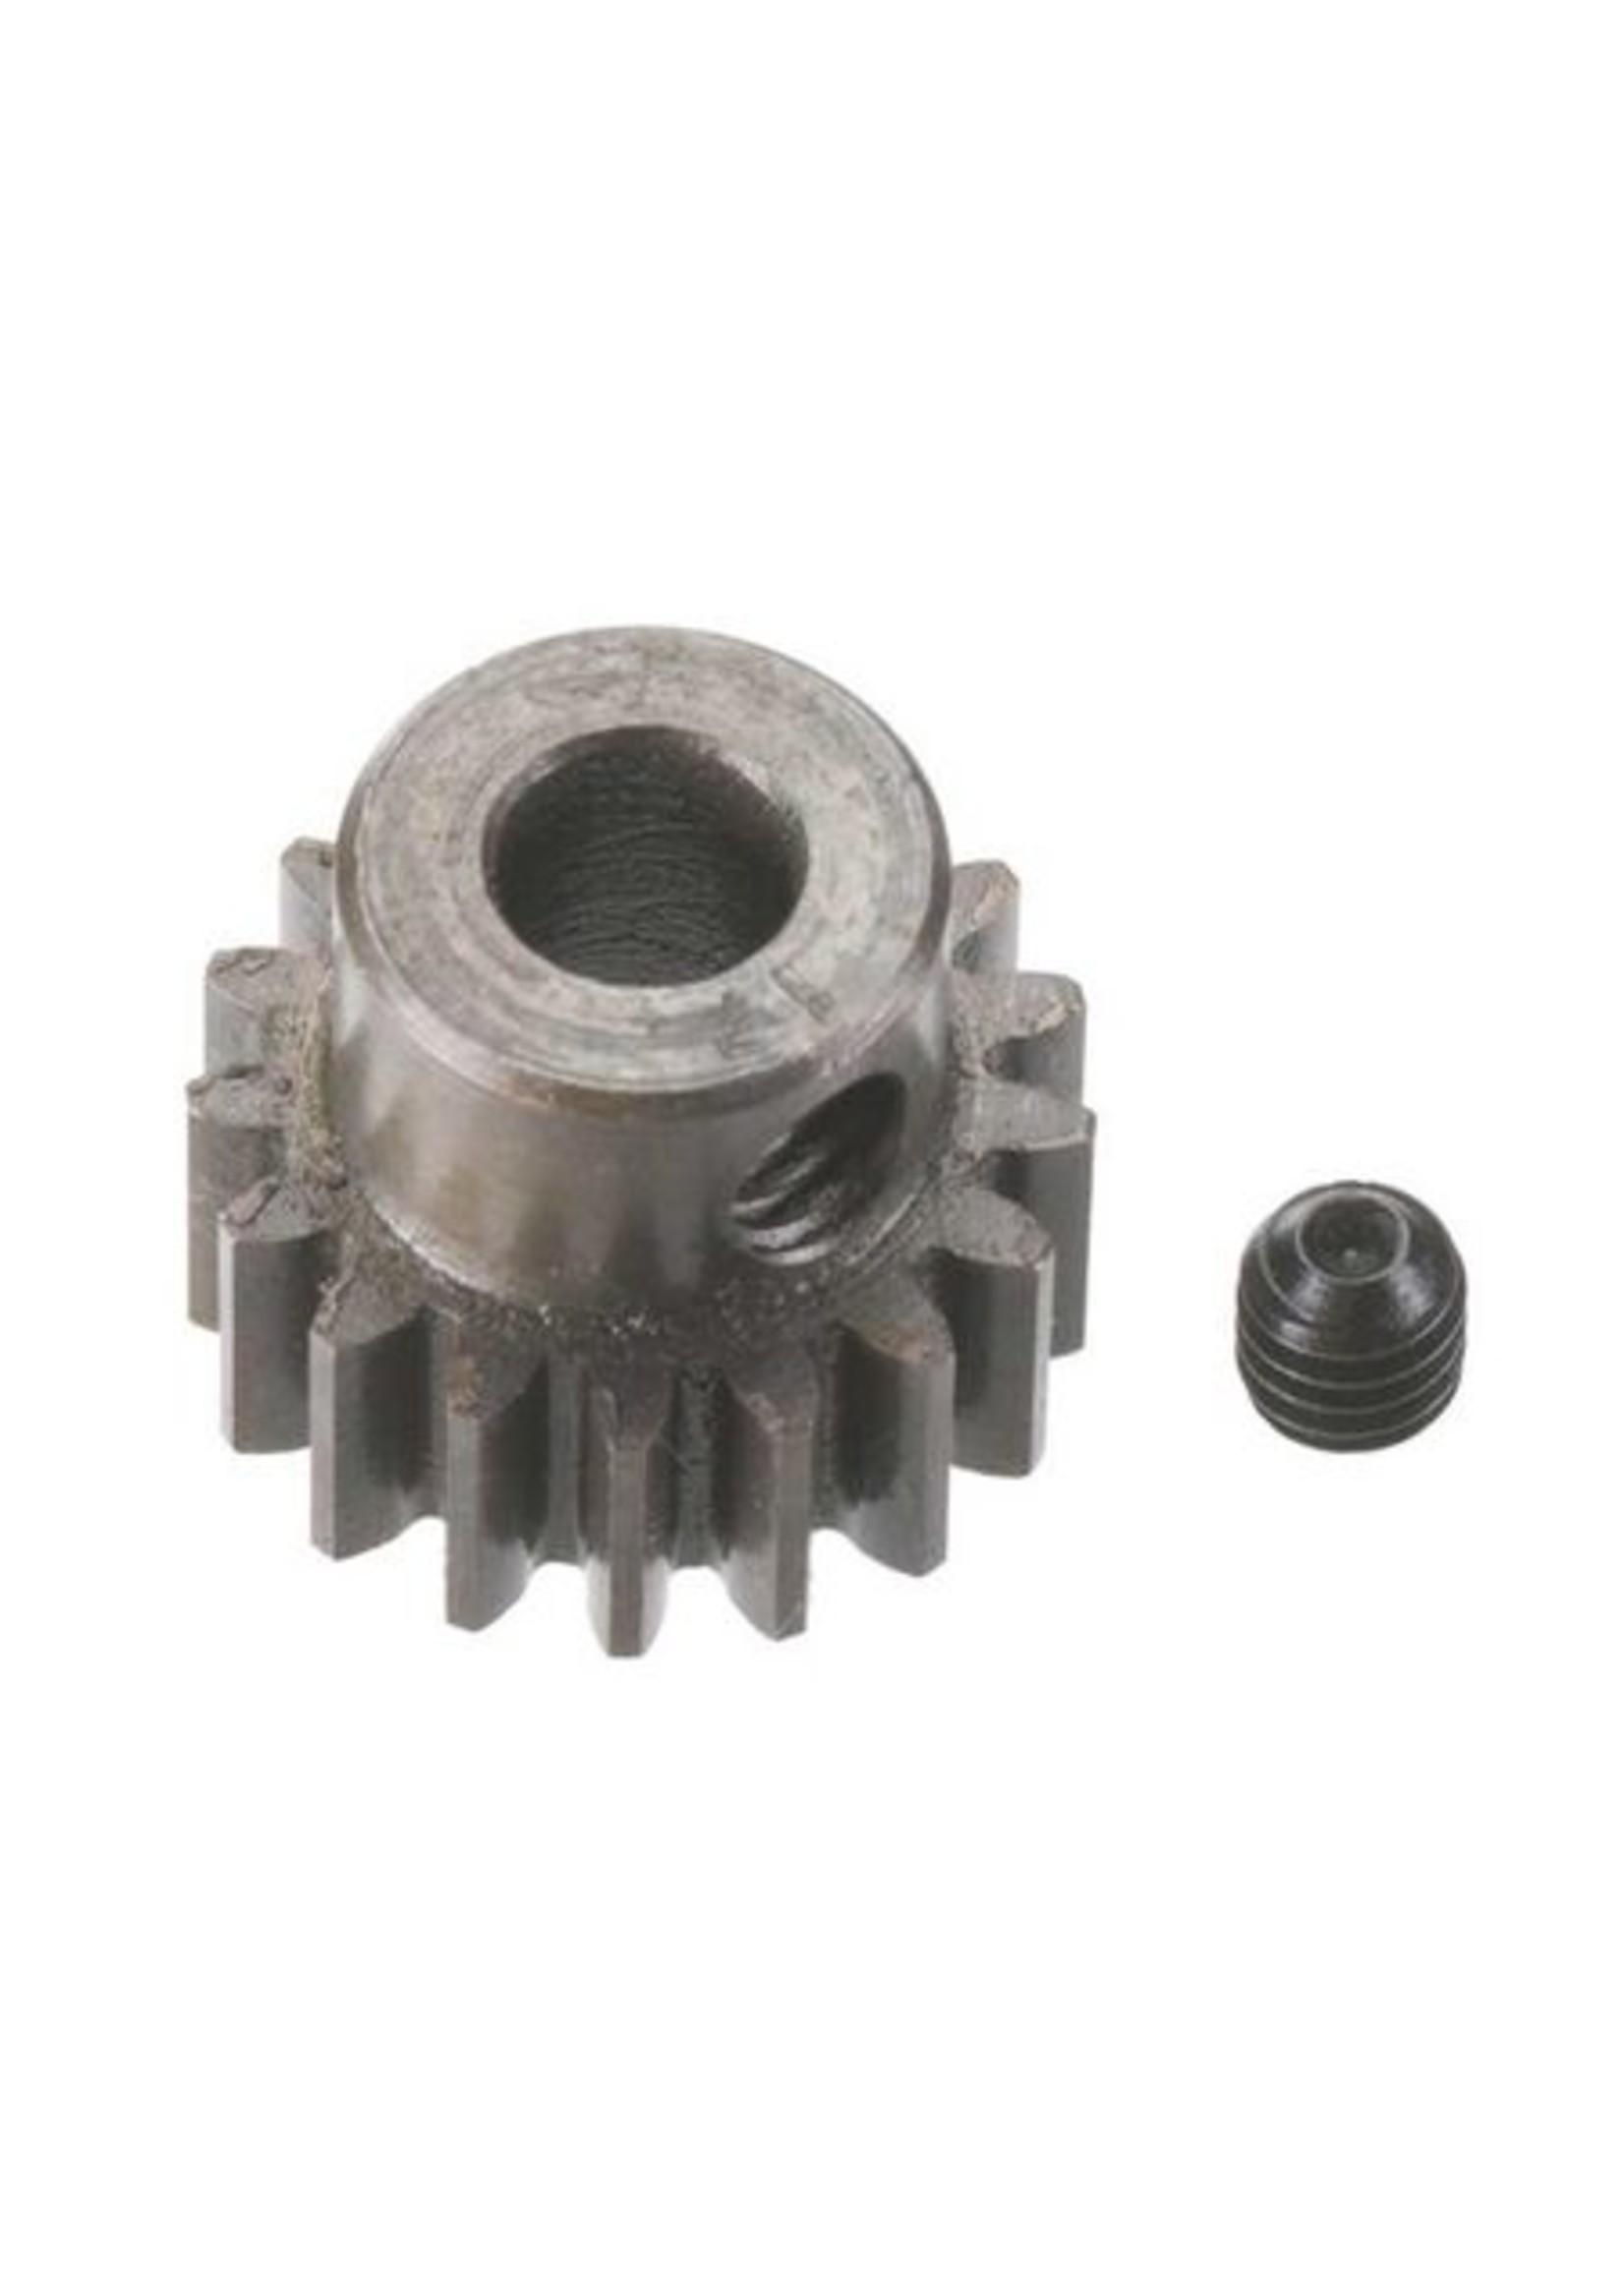 Robinson Racing Products RRP8717 Robinson Racing Extra Hard Steel .8 Mod Pinion Gear w/5mm Bore (17T)